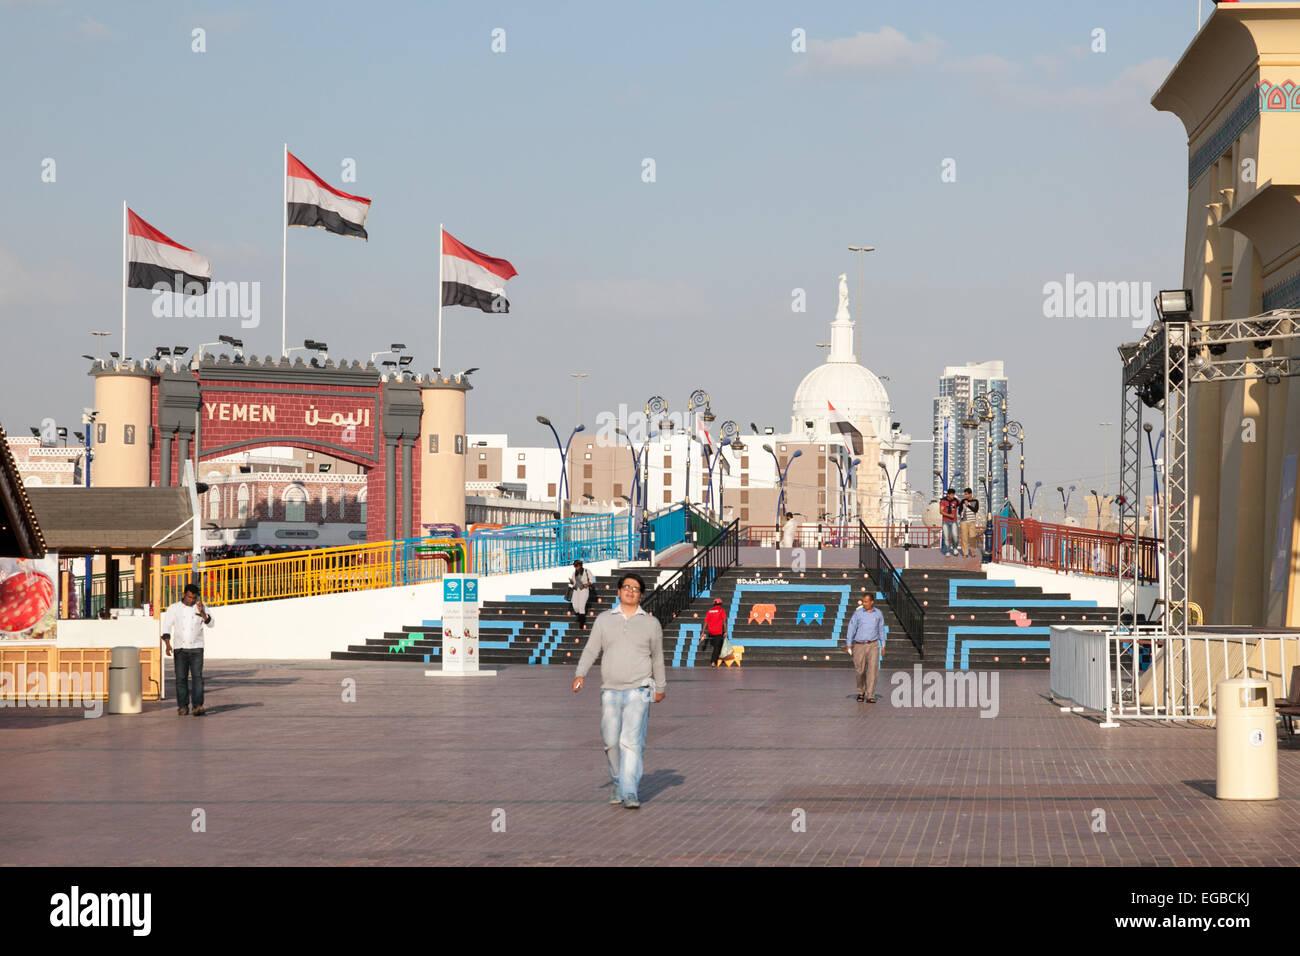 Yemen Pavilion at the Global Village in Dubai - Stock Image